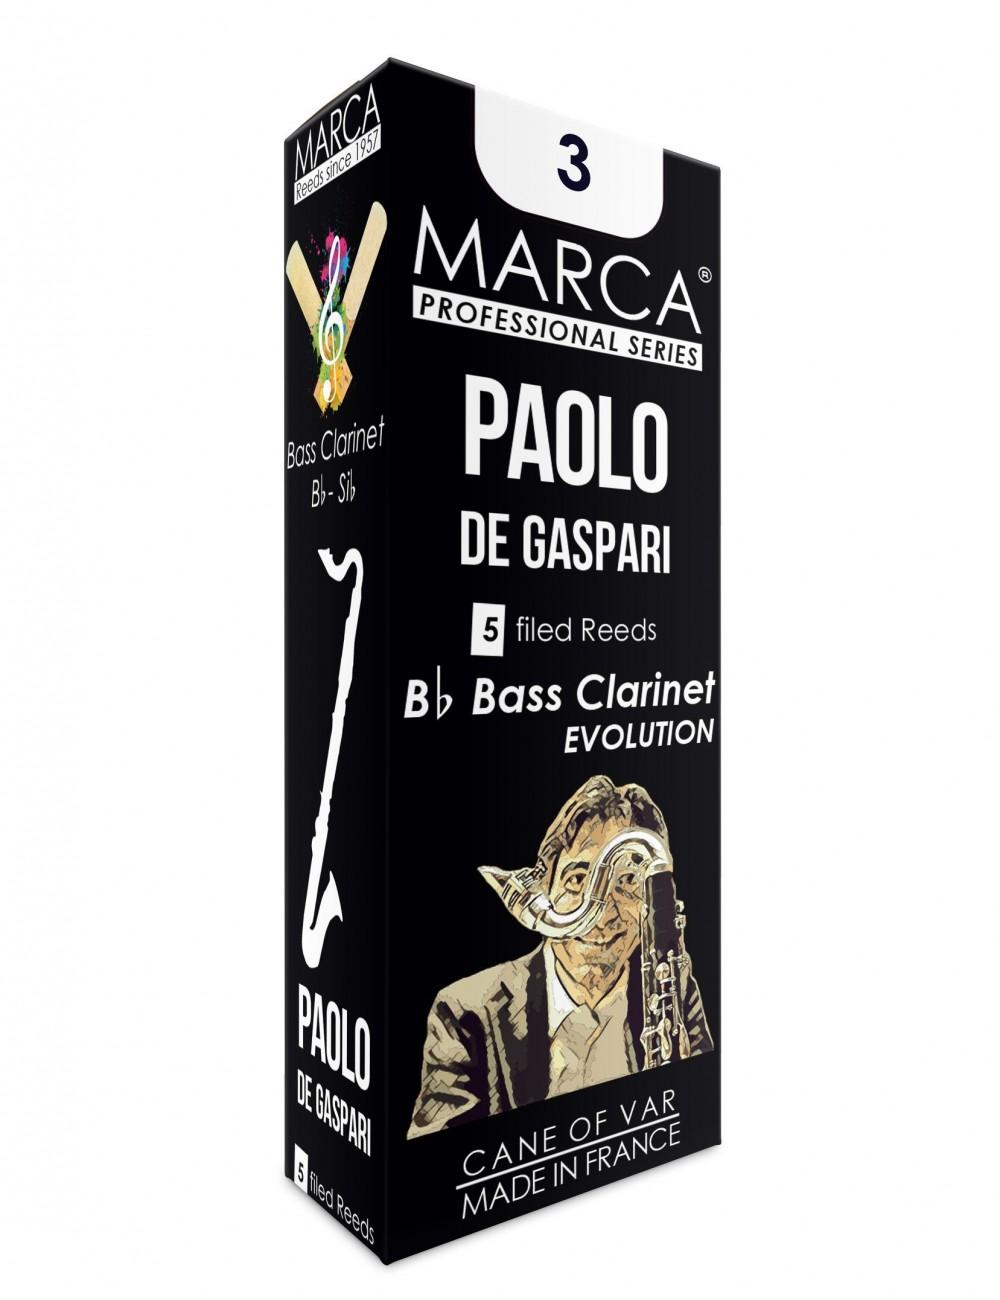 5 REEDS MARCA PAOLO DE GASPARI BASS CLARINET 3